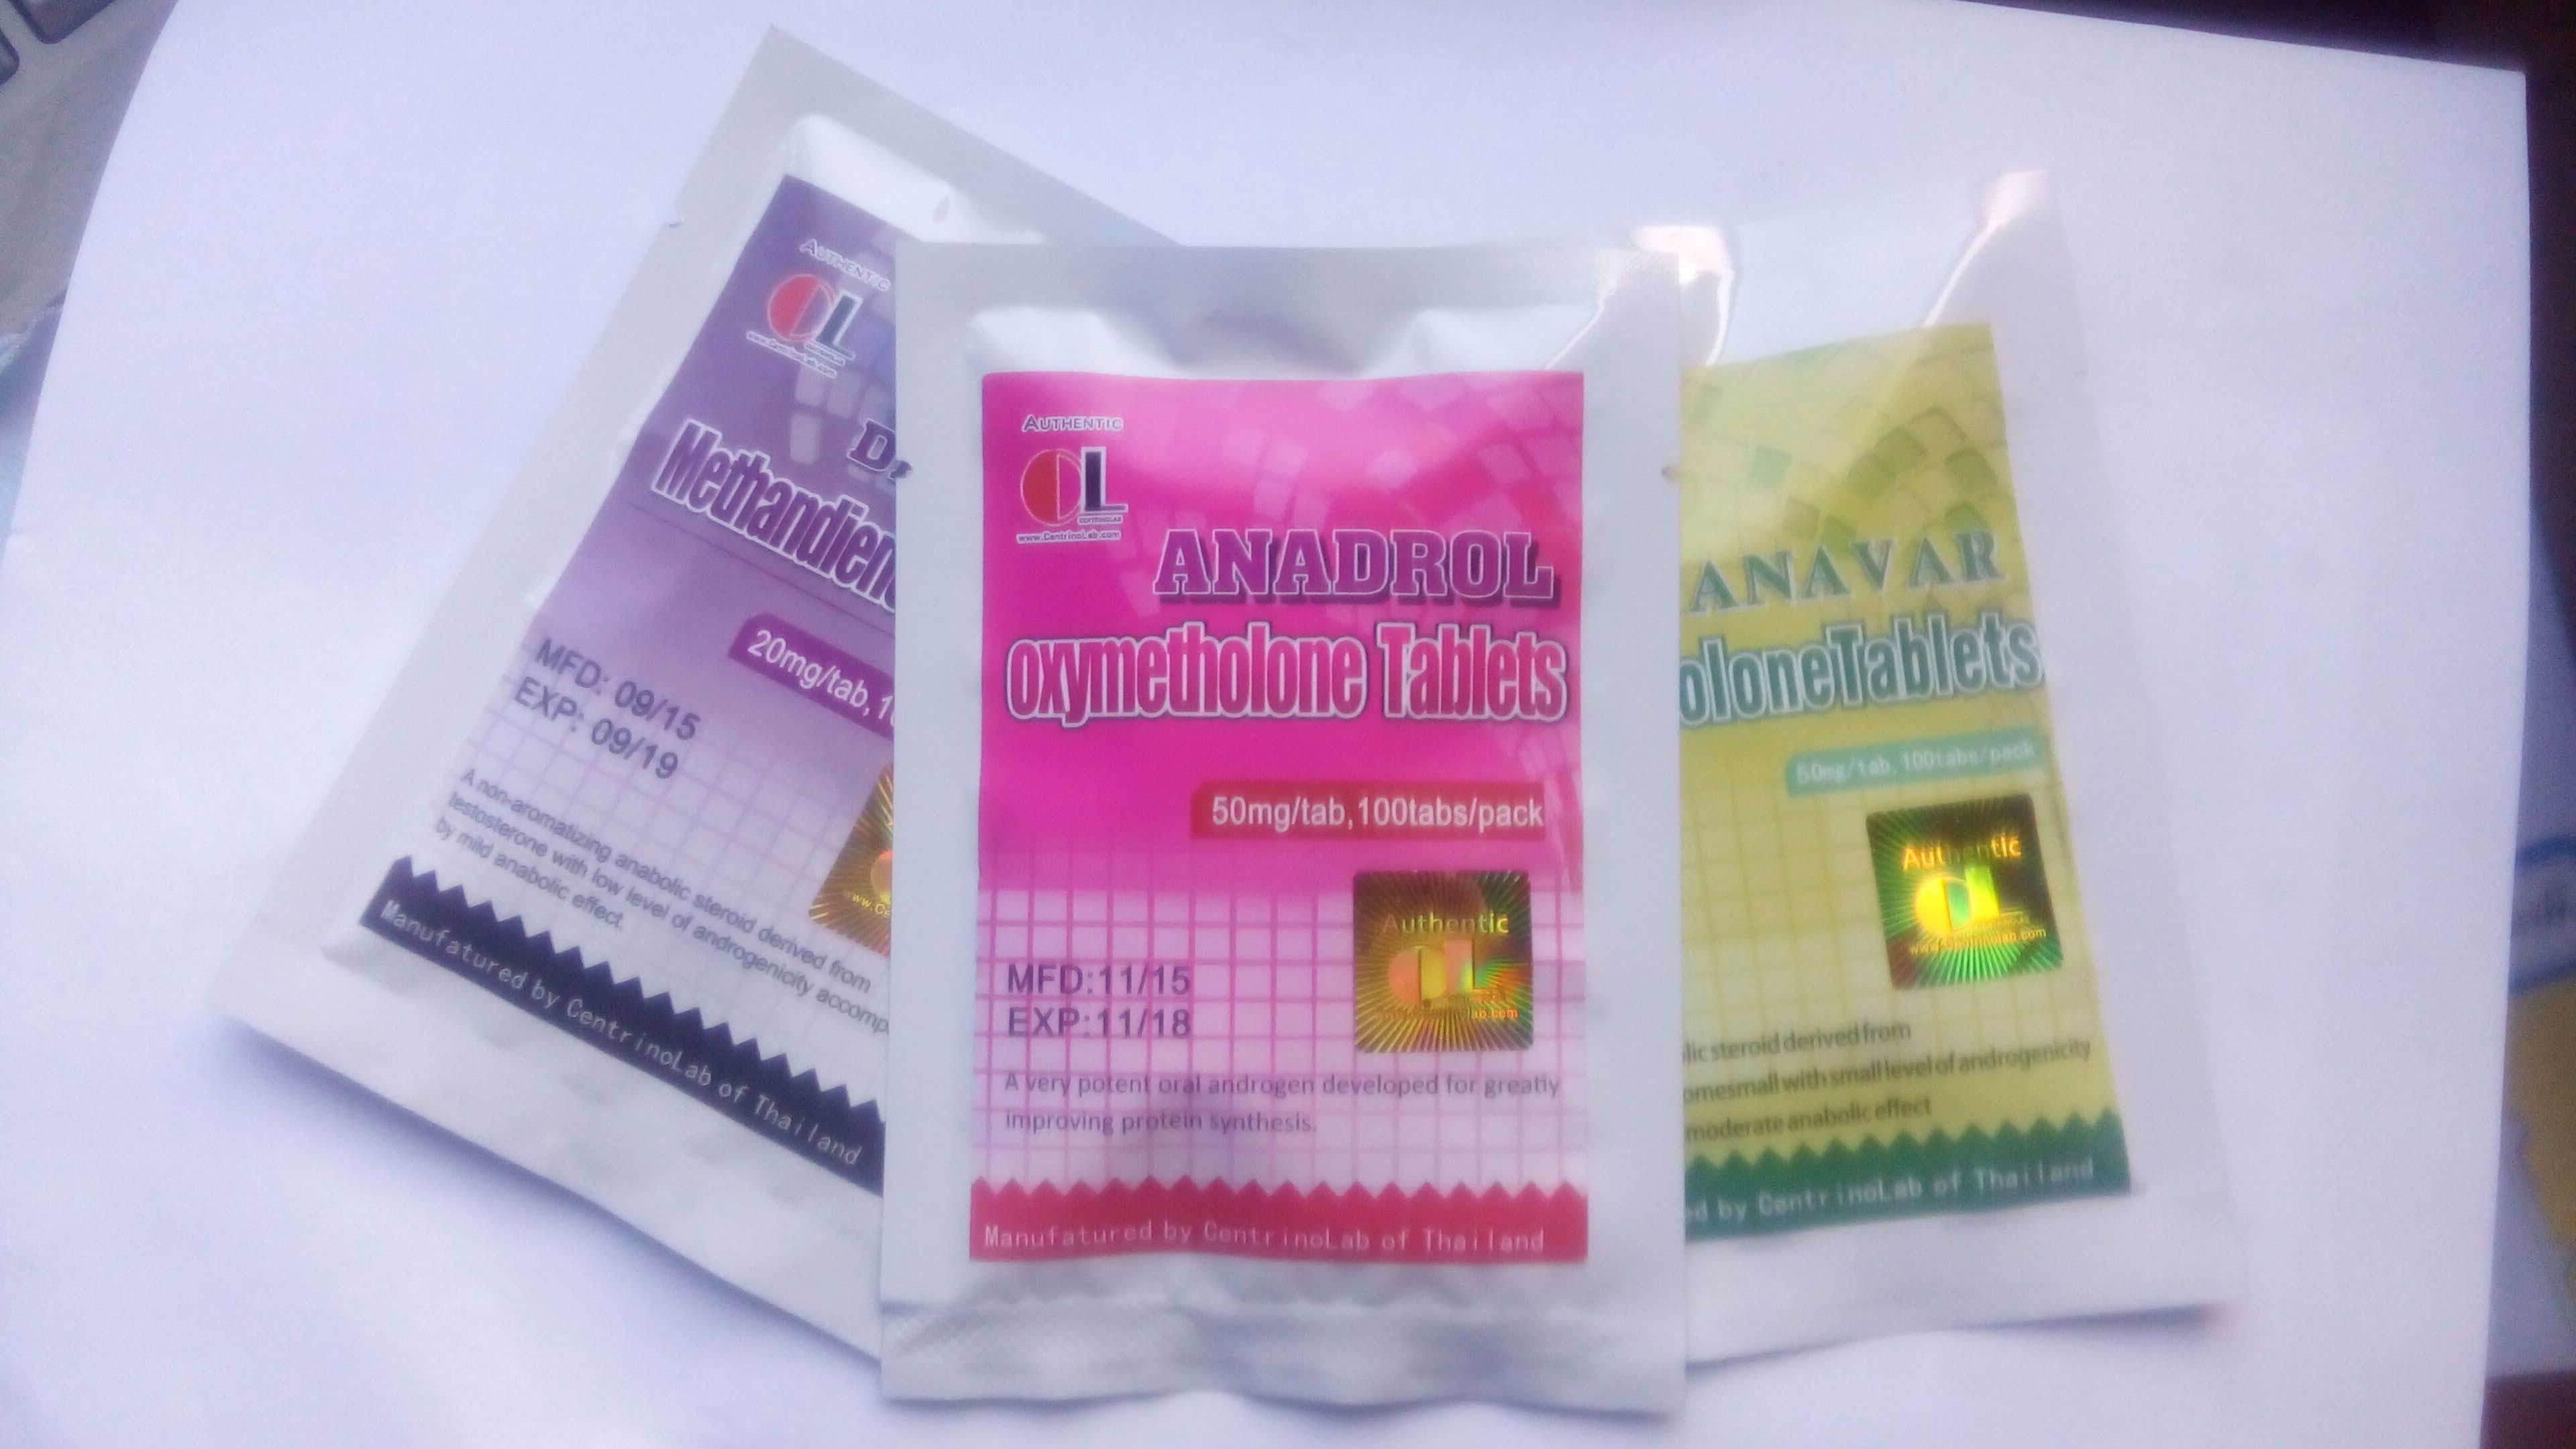 Oral Steroid Hormones Oxymetholon (Anadrol)